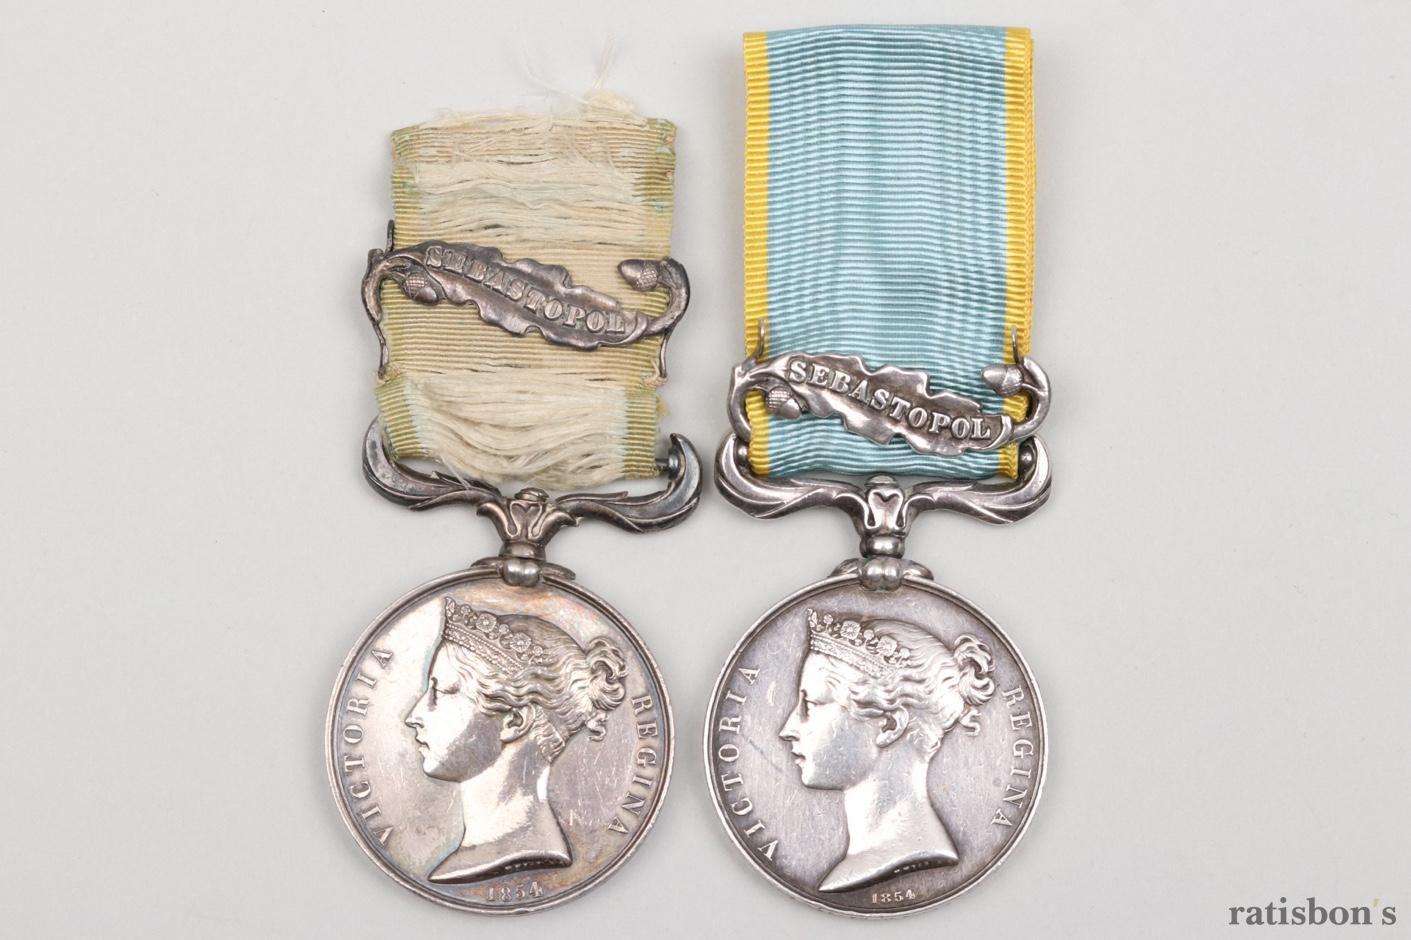 ratisbon's | 2 + Great Britain Crimea Medals with Sebastopol clasp